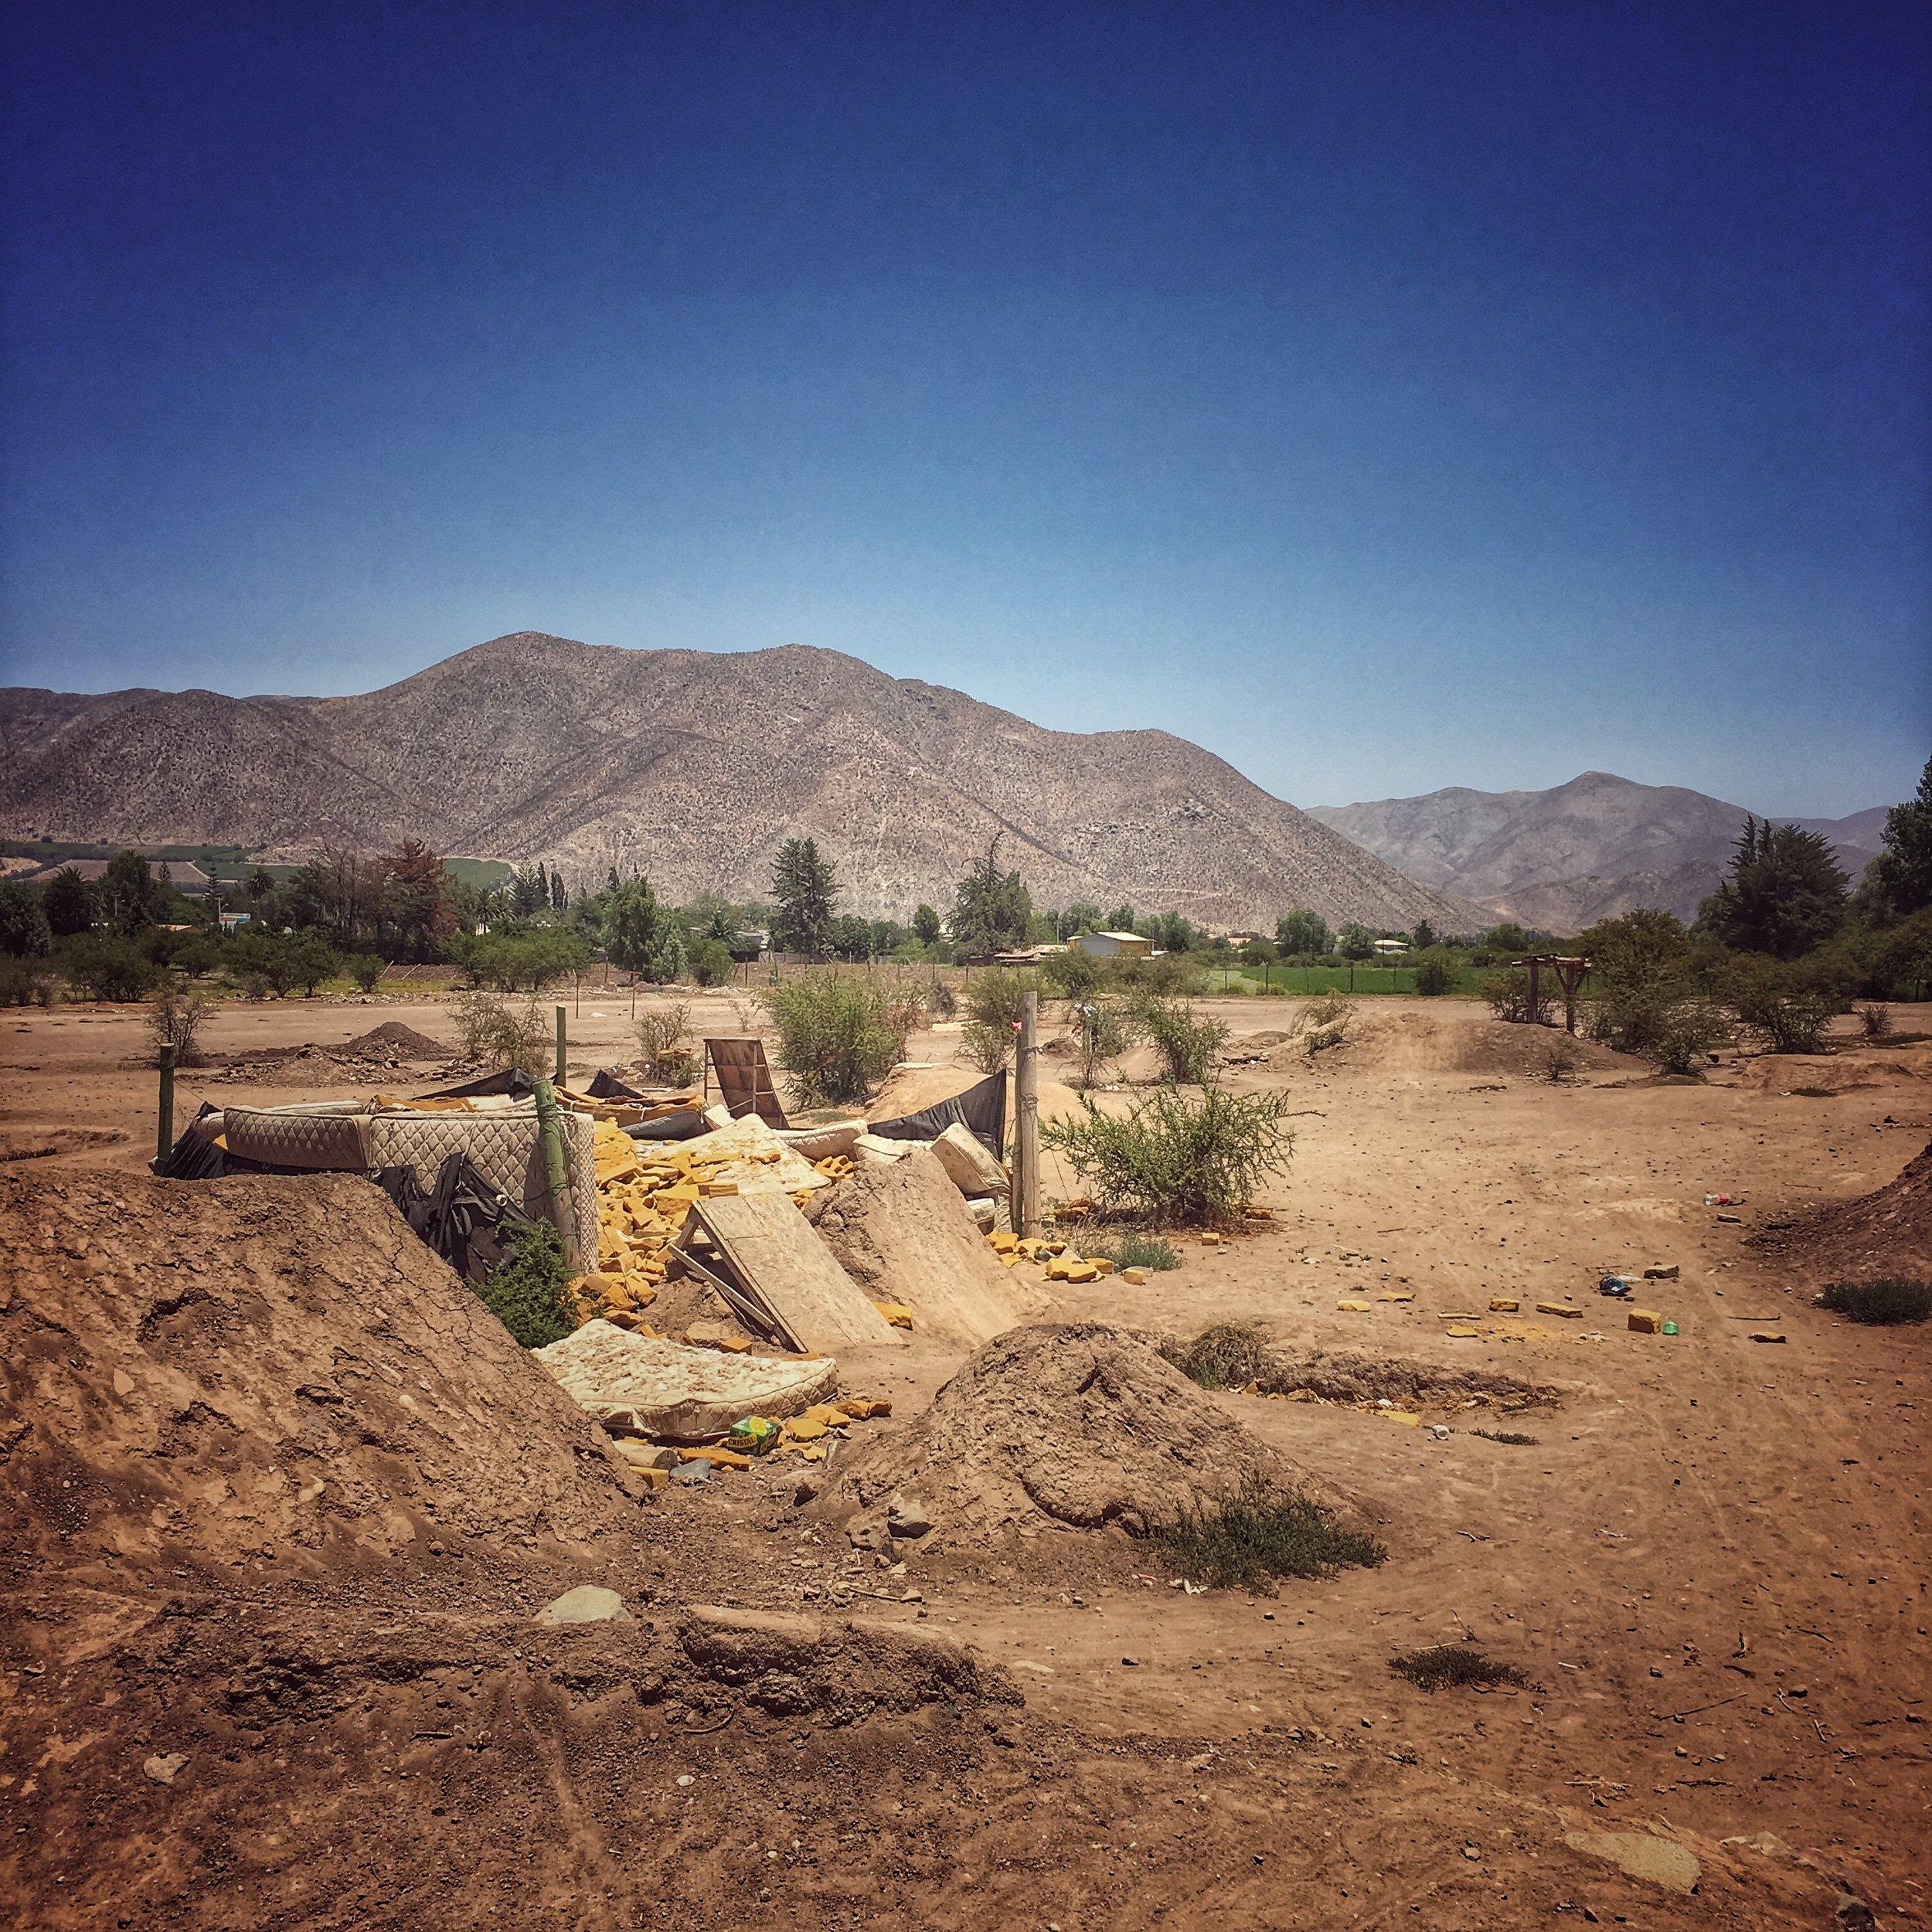 dustbowl BMX track: Vicuña